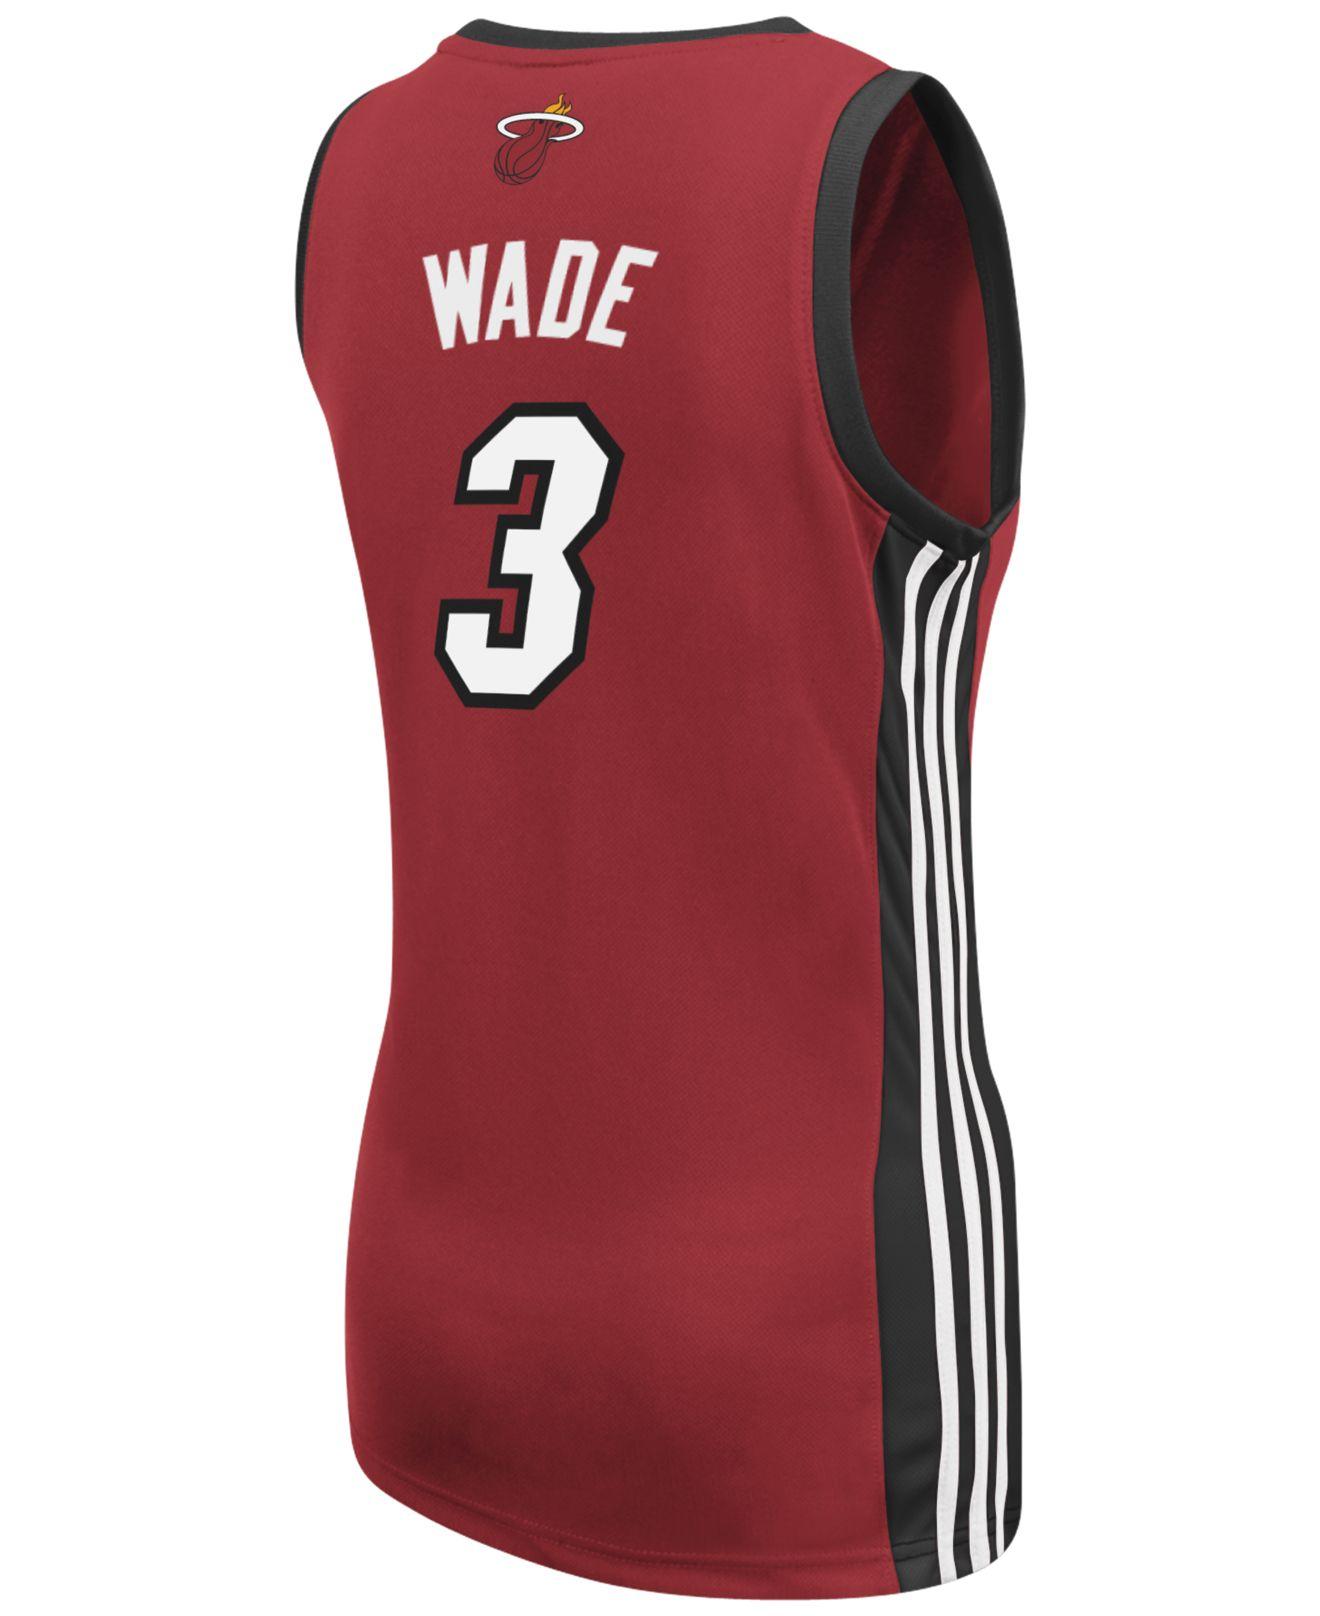 Lyst - adidas Originals Women s Dwyane Wade Miami Heat Jersey in Red 9d89dd494